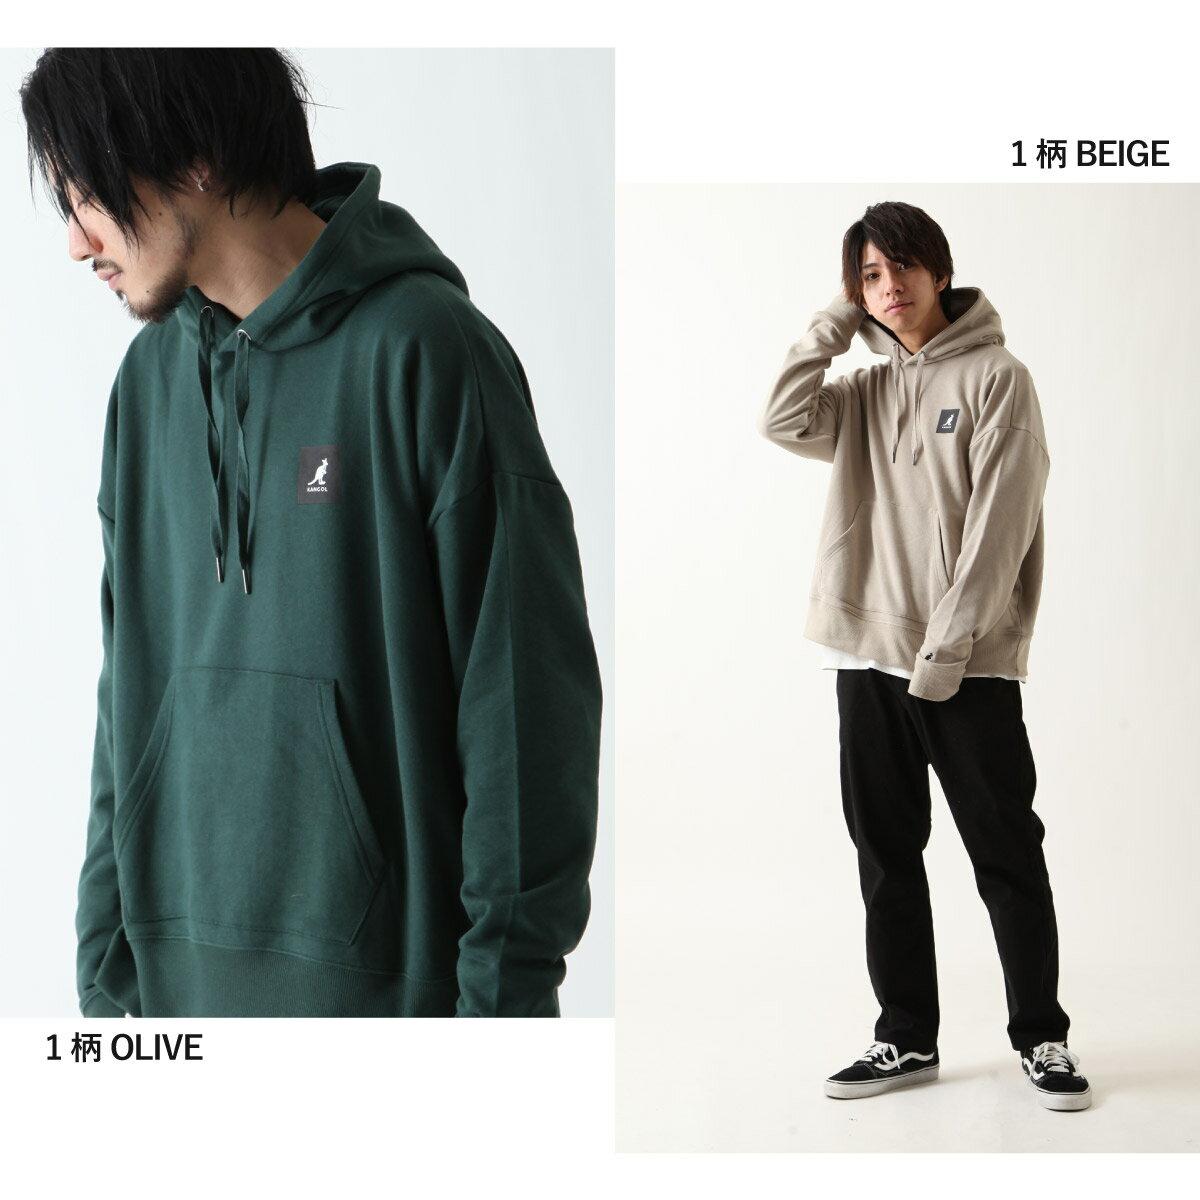 【New】KANGOL LOGO設計連帽衫 【L-XL】 1